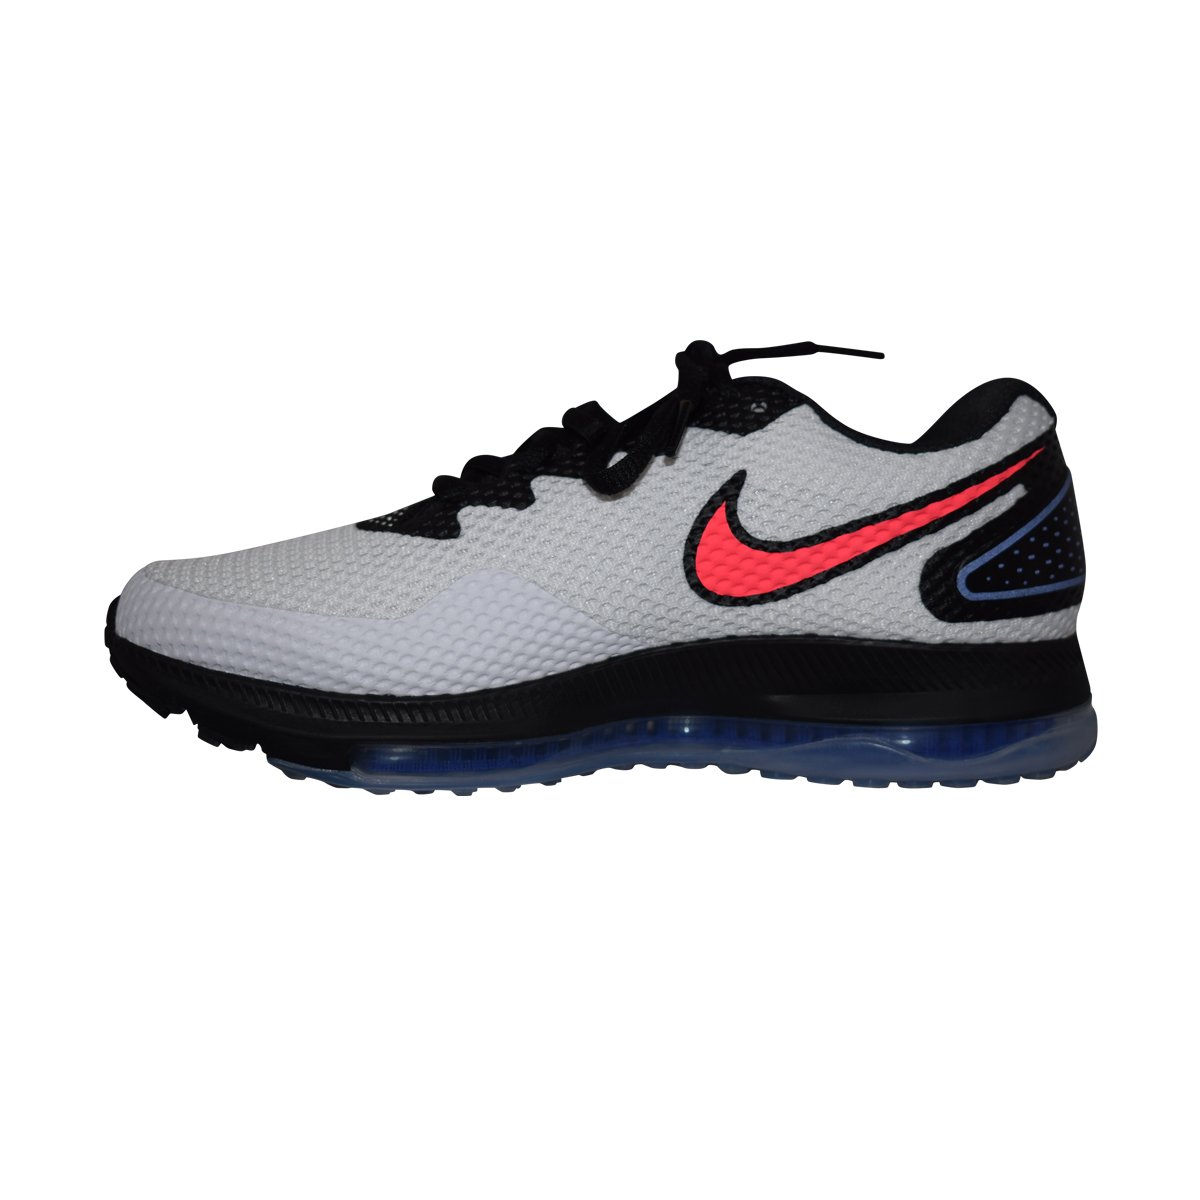 Zapatillas de running Nike Rojo Zoom All Out Low para Solar mujer